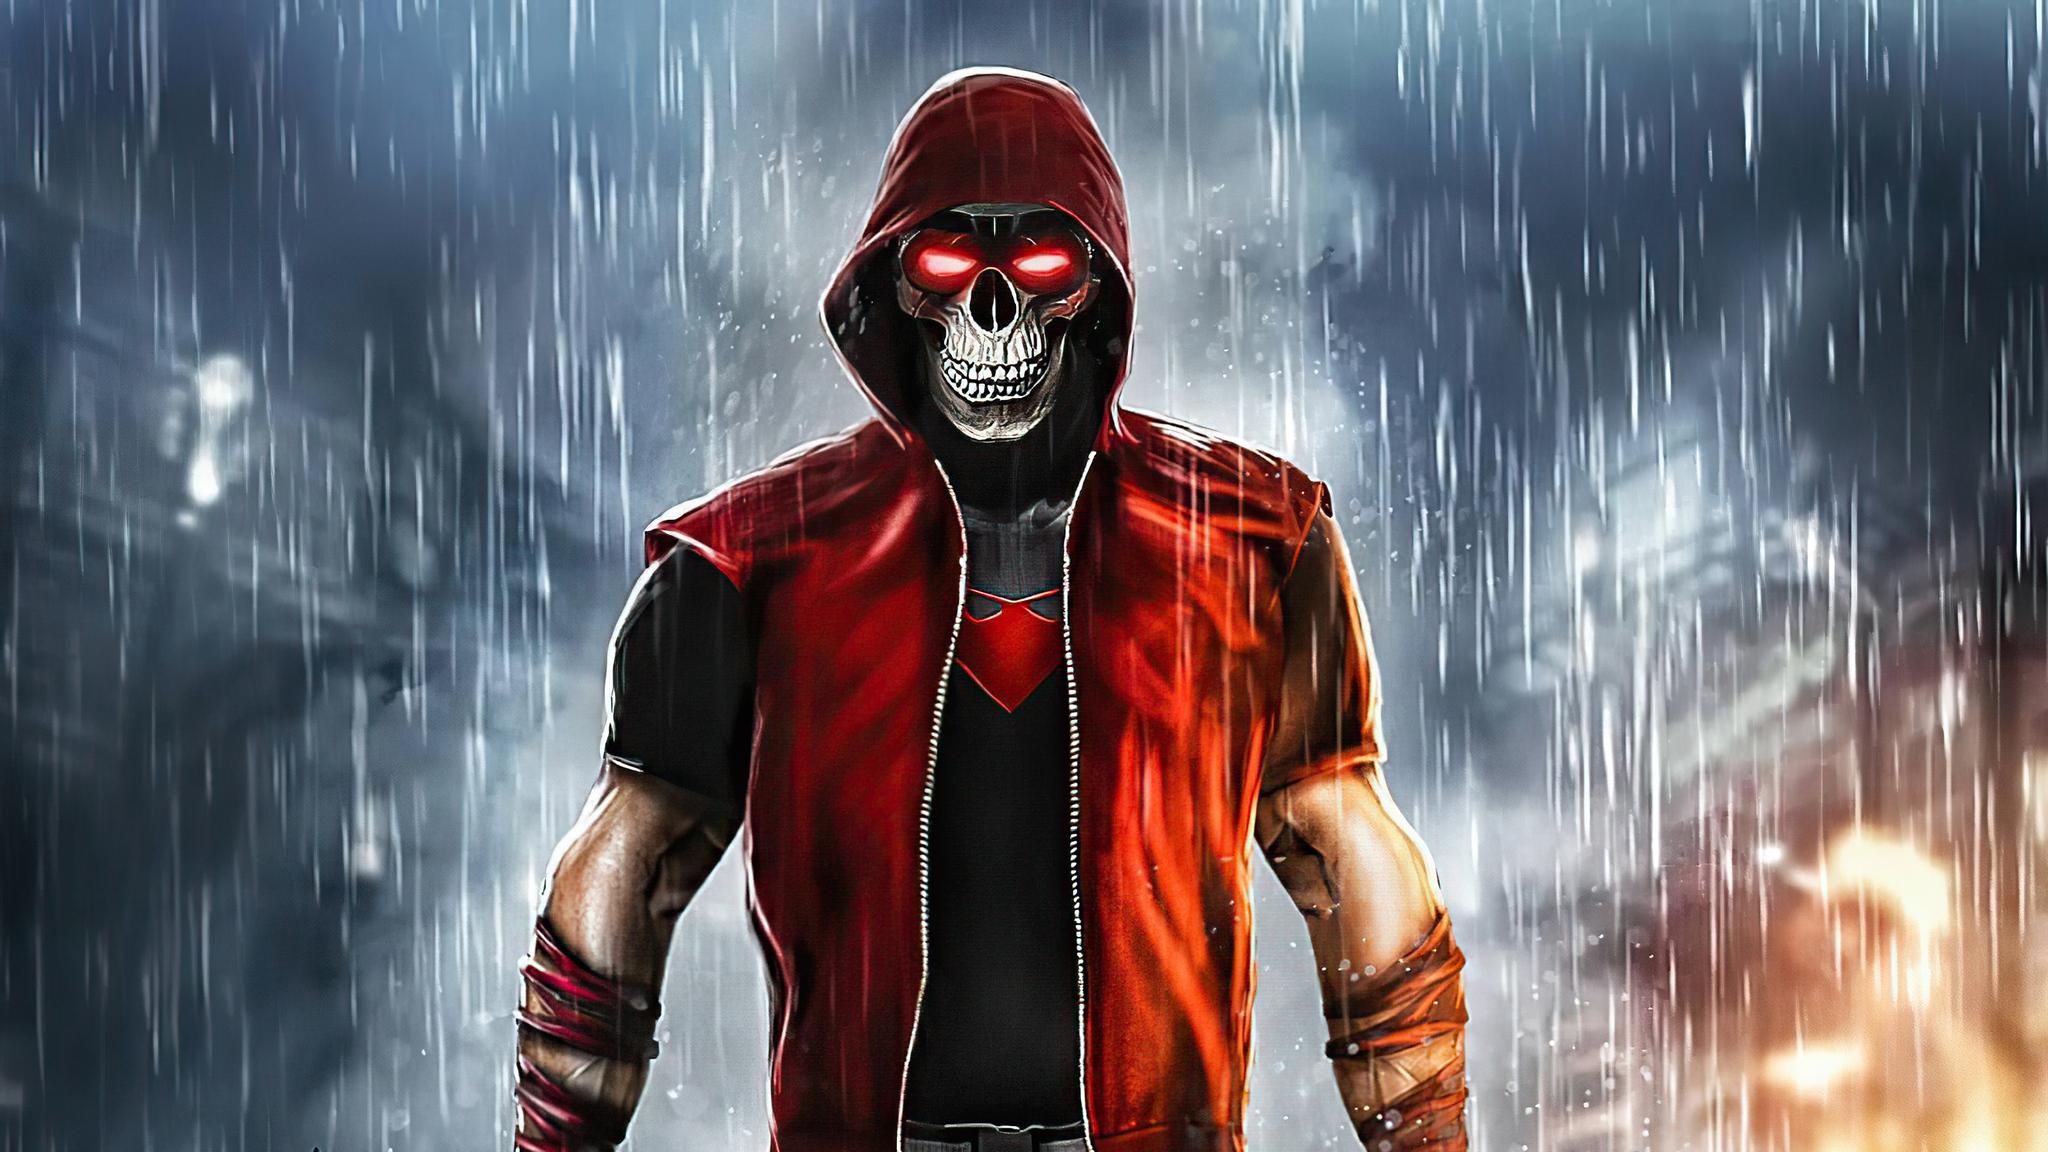 red-hood-comic-book-art-4k-ns.jpg